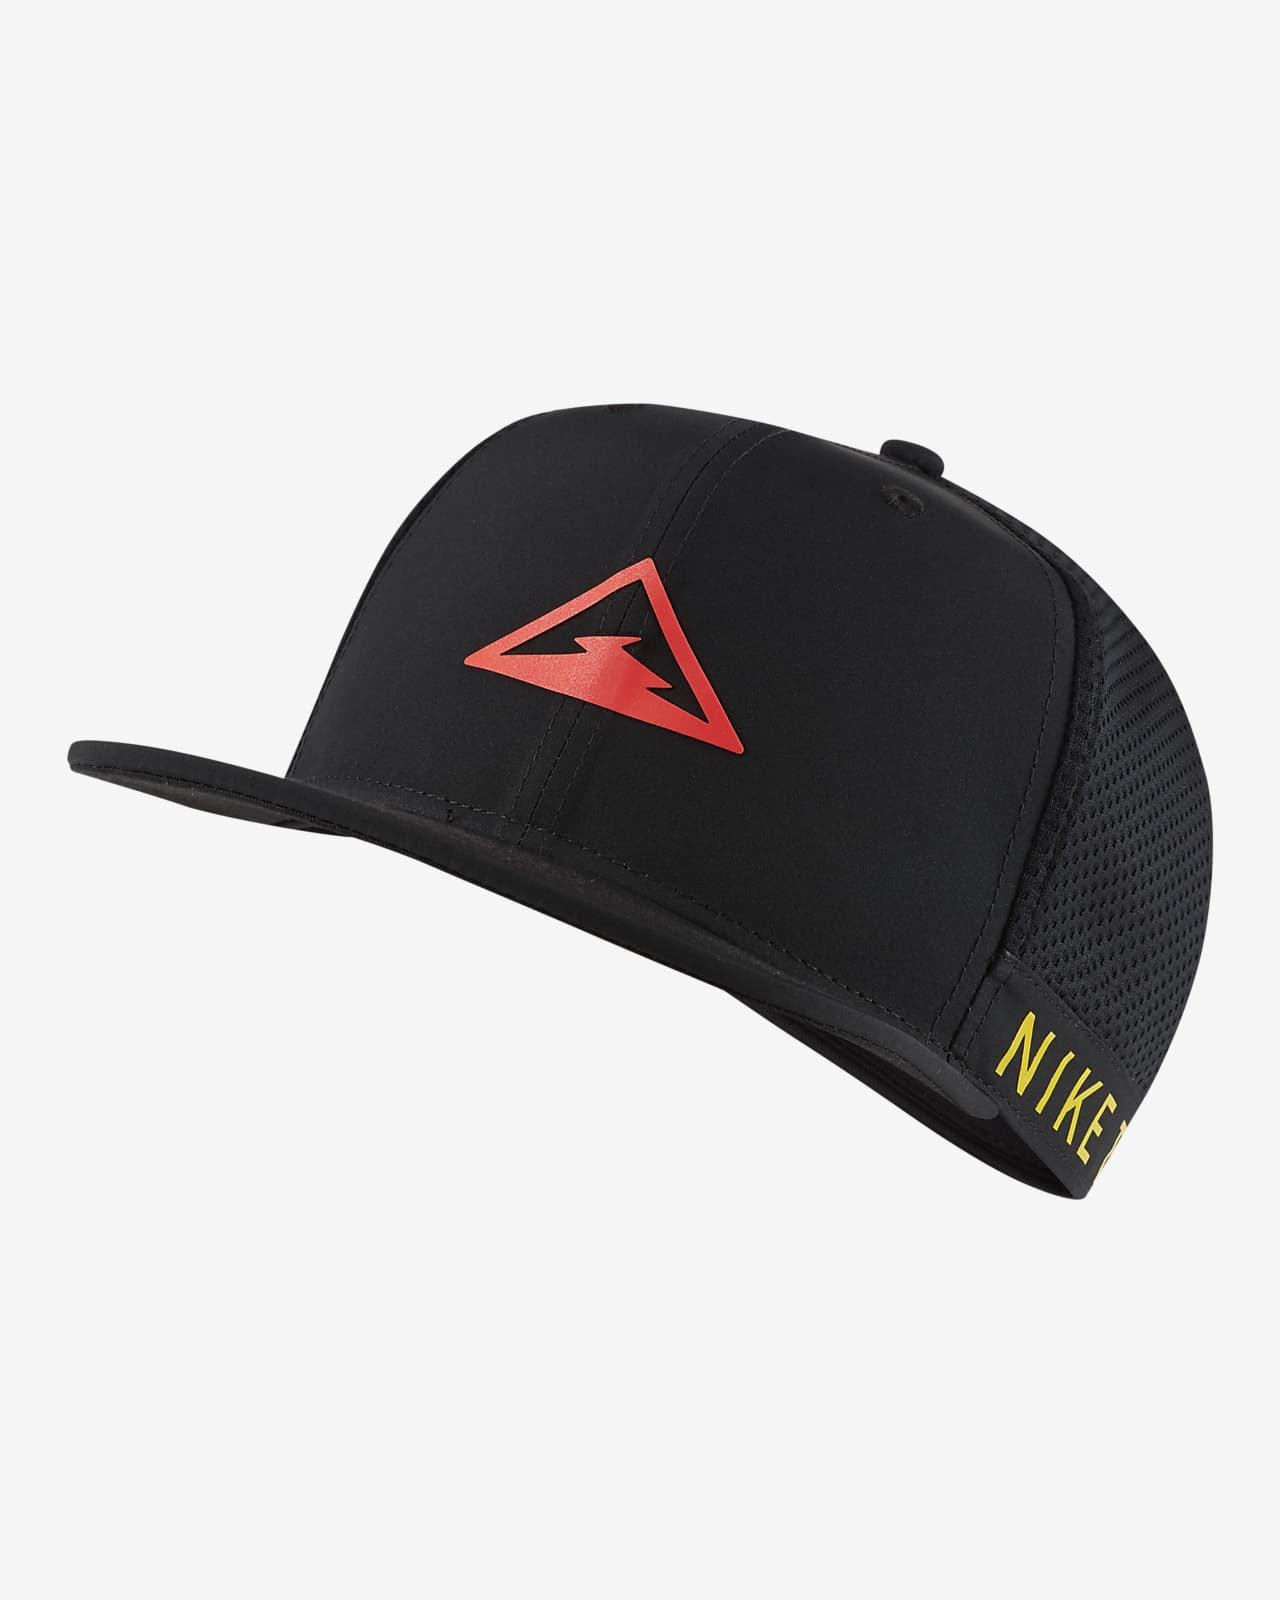 Nike Dri-FIT Pro terrengcaps